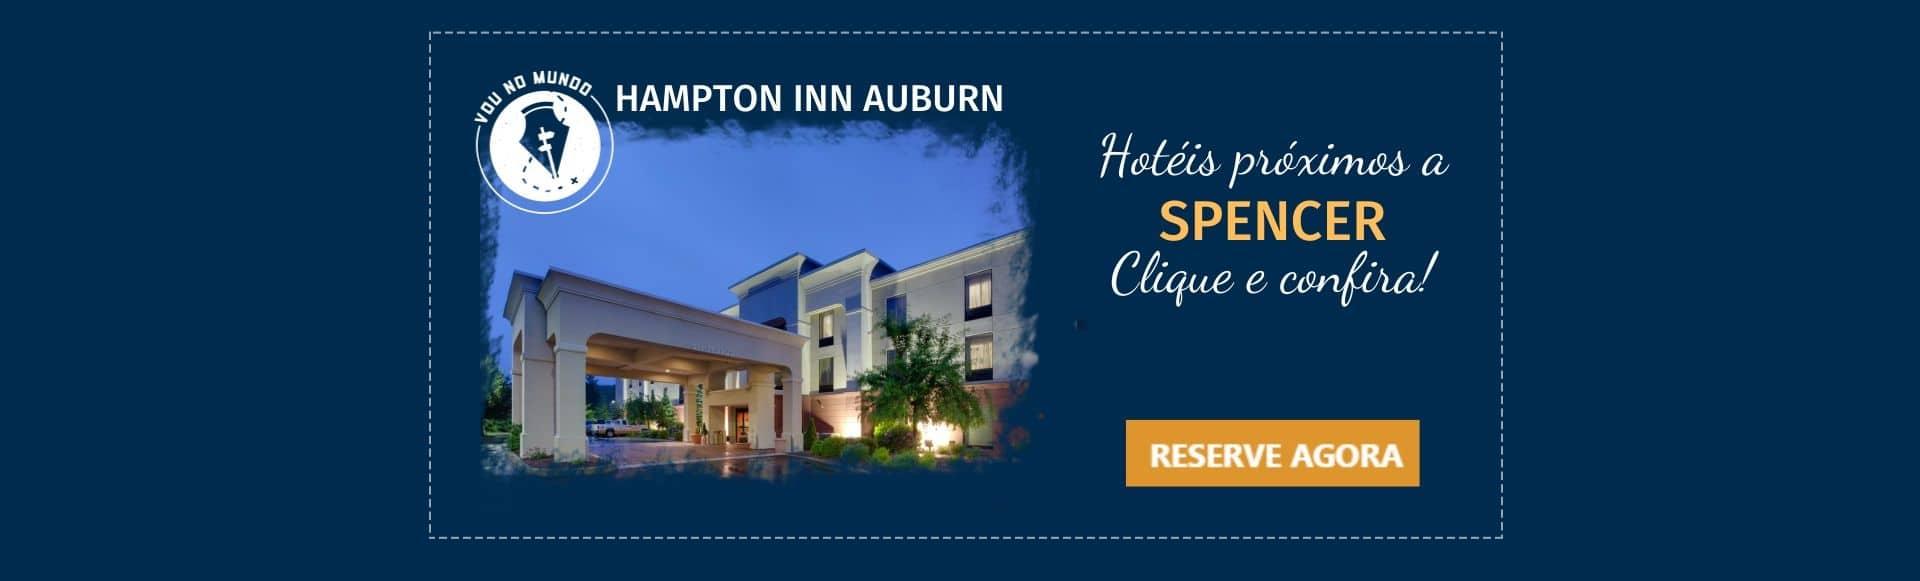 Hotel Hampton Inn Auburn, próximo a Spencer, EUA.